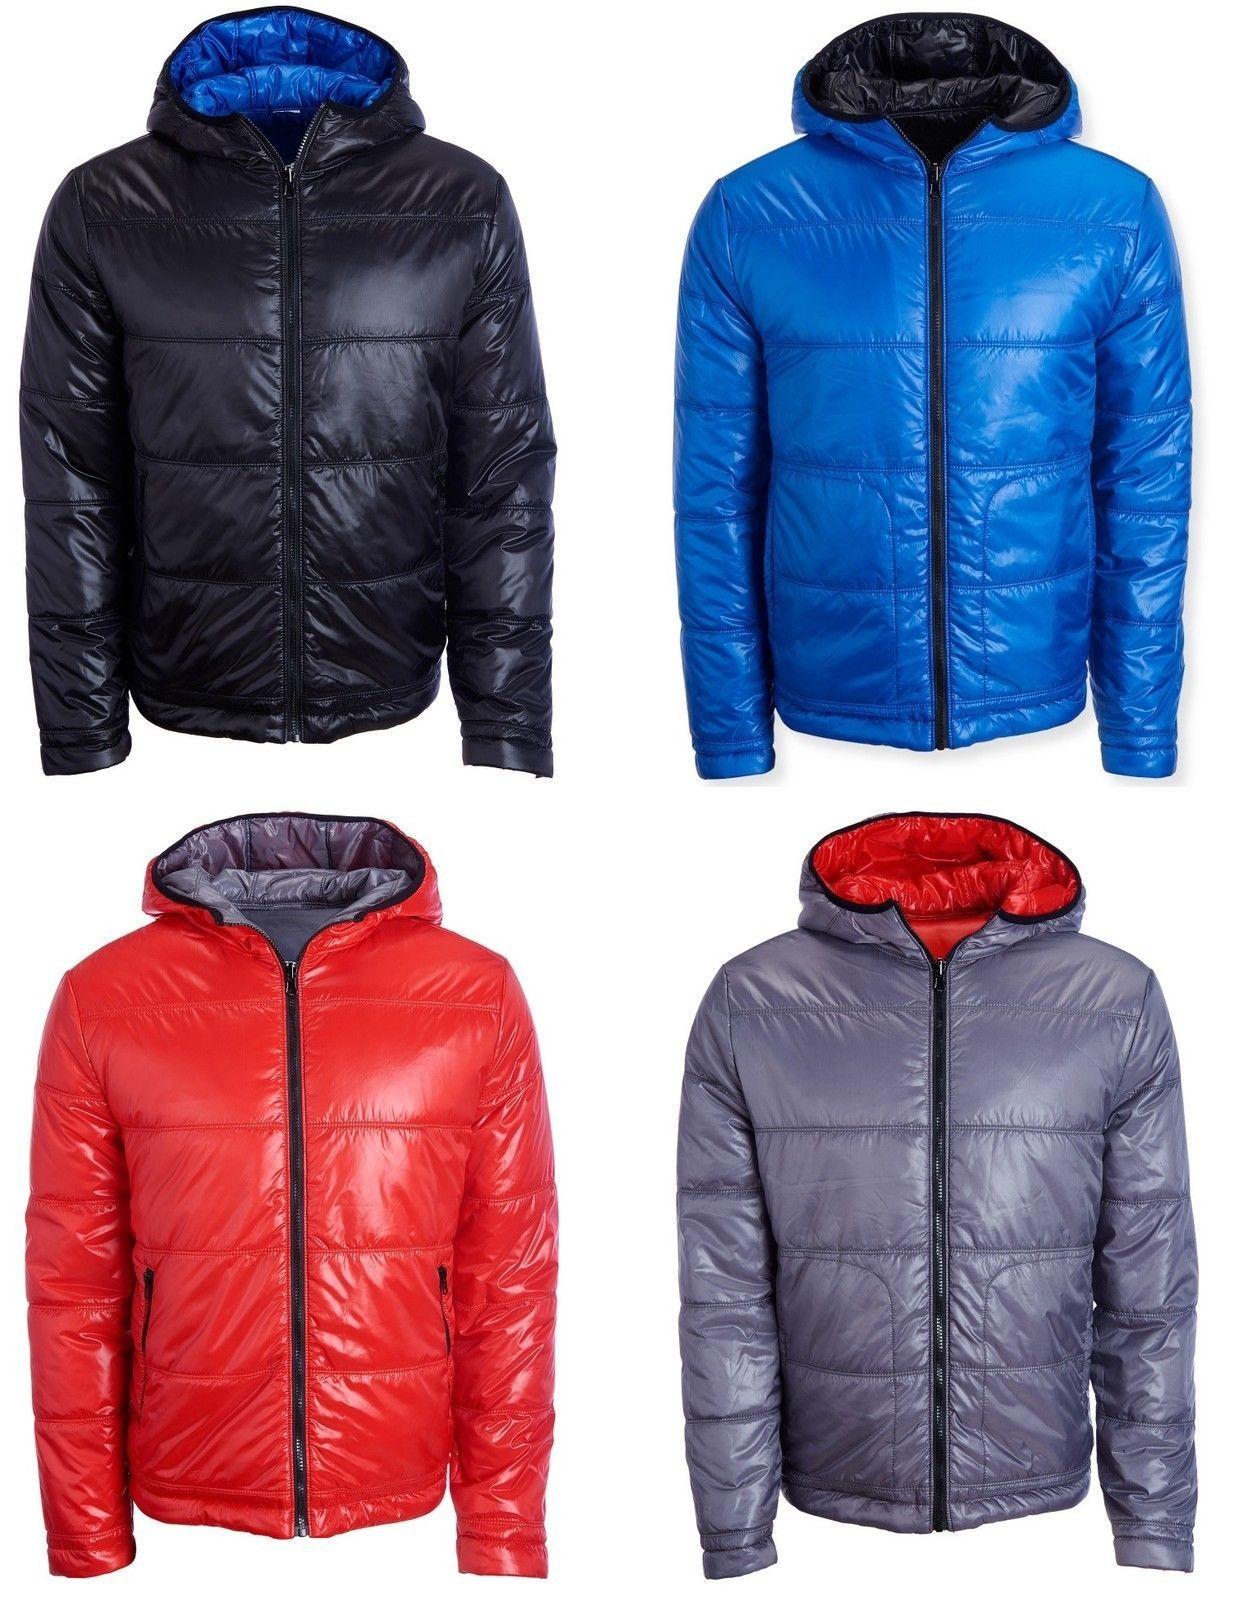 Aero Aeropostale Mens Reversible Puffer Jacket Winter Coat Xs S M L Xl 2xl 3xl Jackets Winter Jackets Mens Outfits [ 1600 x 1247 Pixel ]